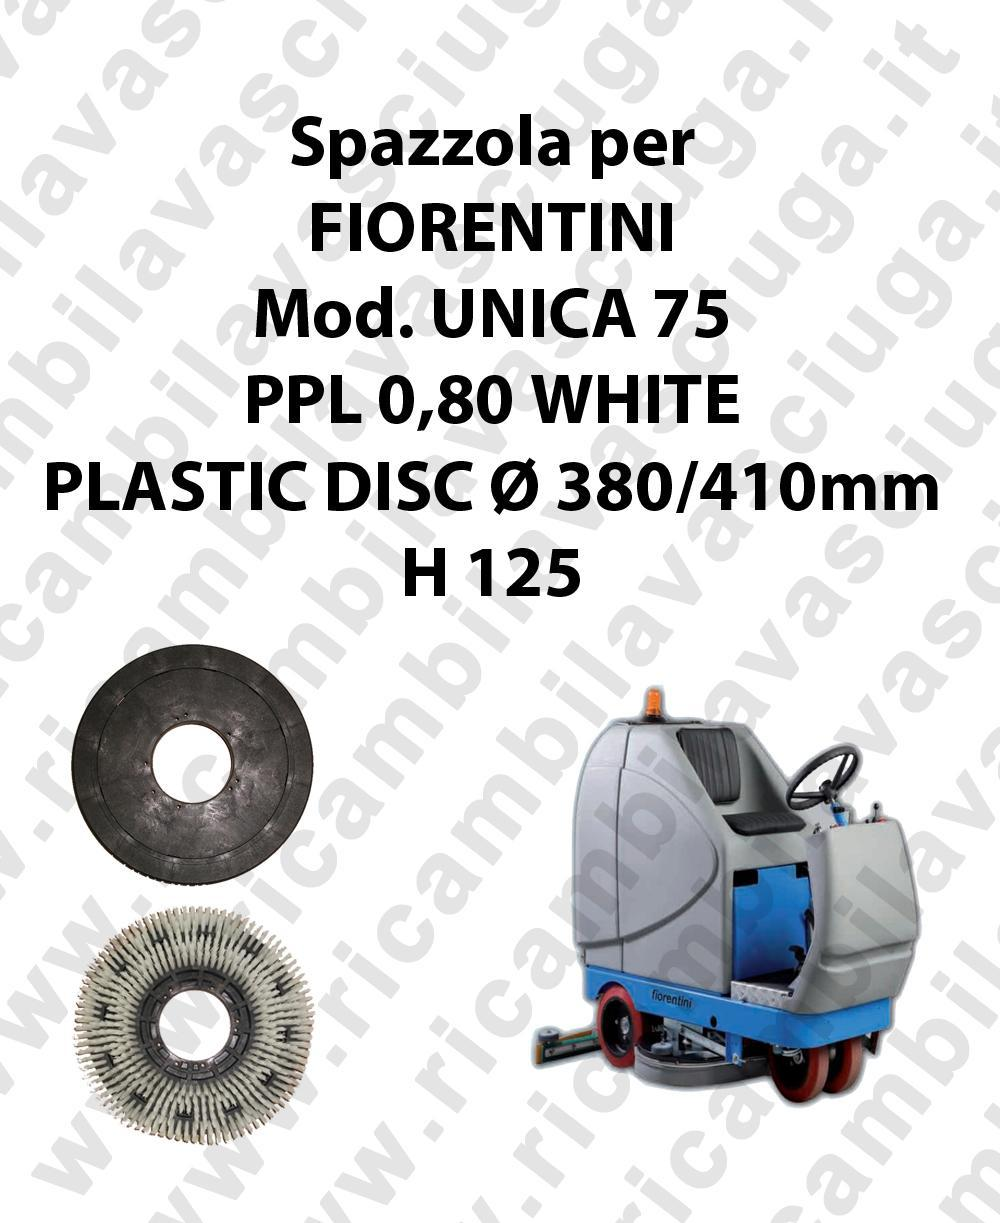 Cleaning Brush PPL 0,80 WHITE for scrubber dryer FIORENTINI Model UNICA 75